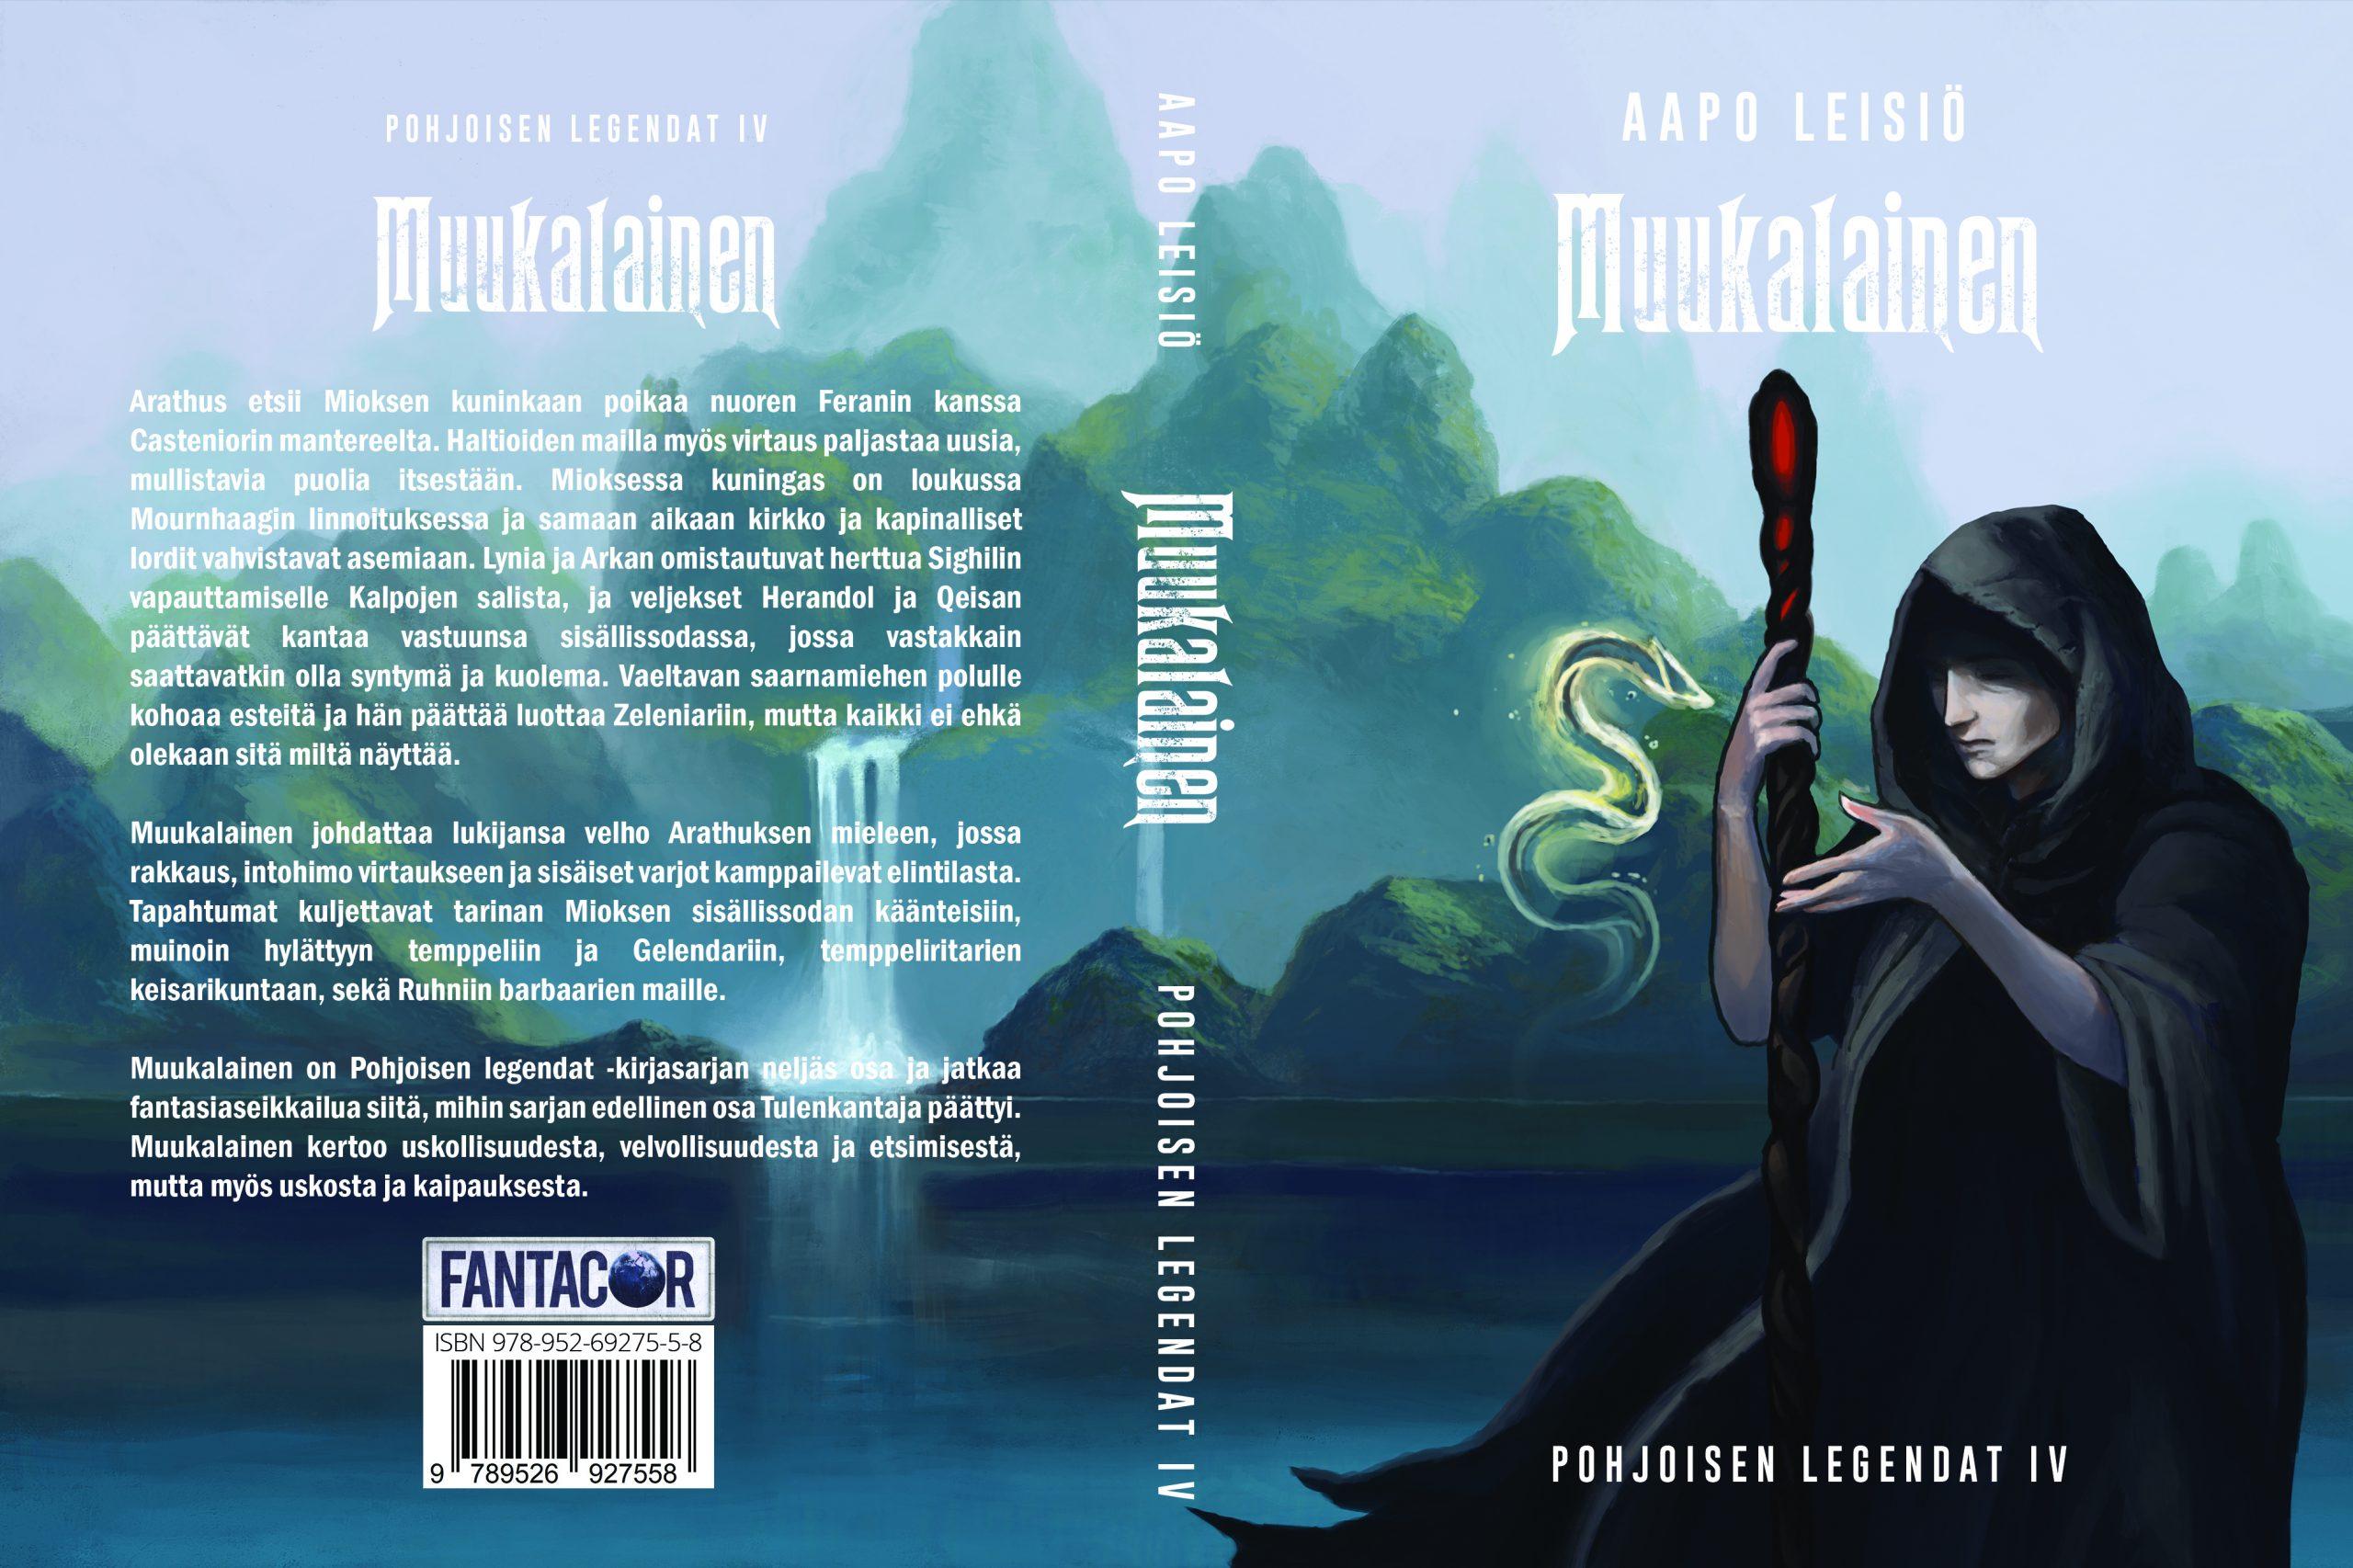 Fantacor-Ky-Muukalainen